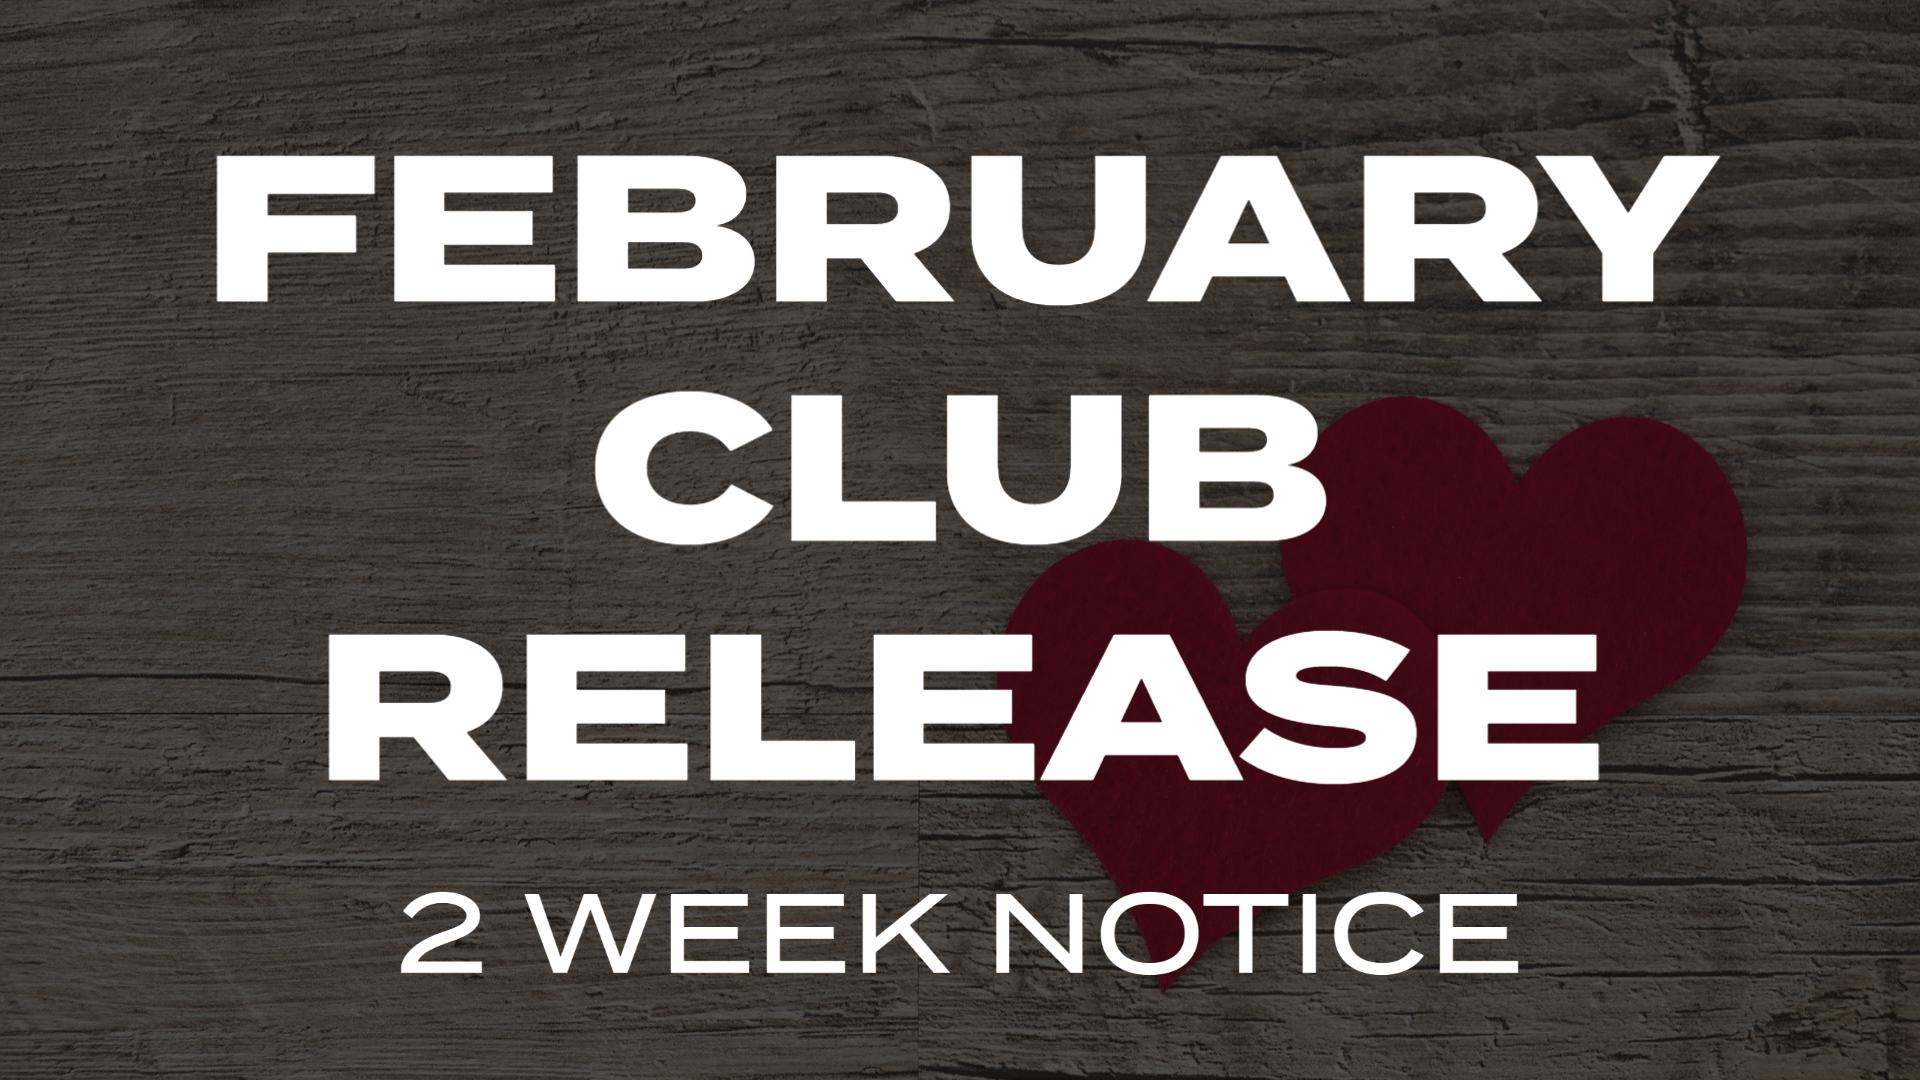 February Club Release 2 Week Notice